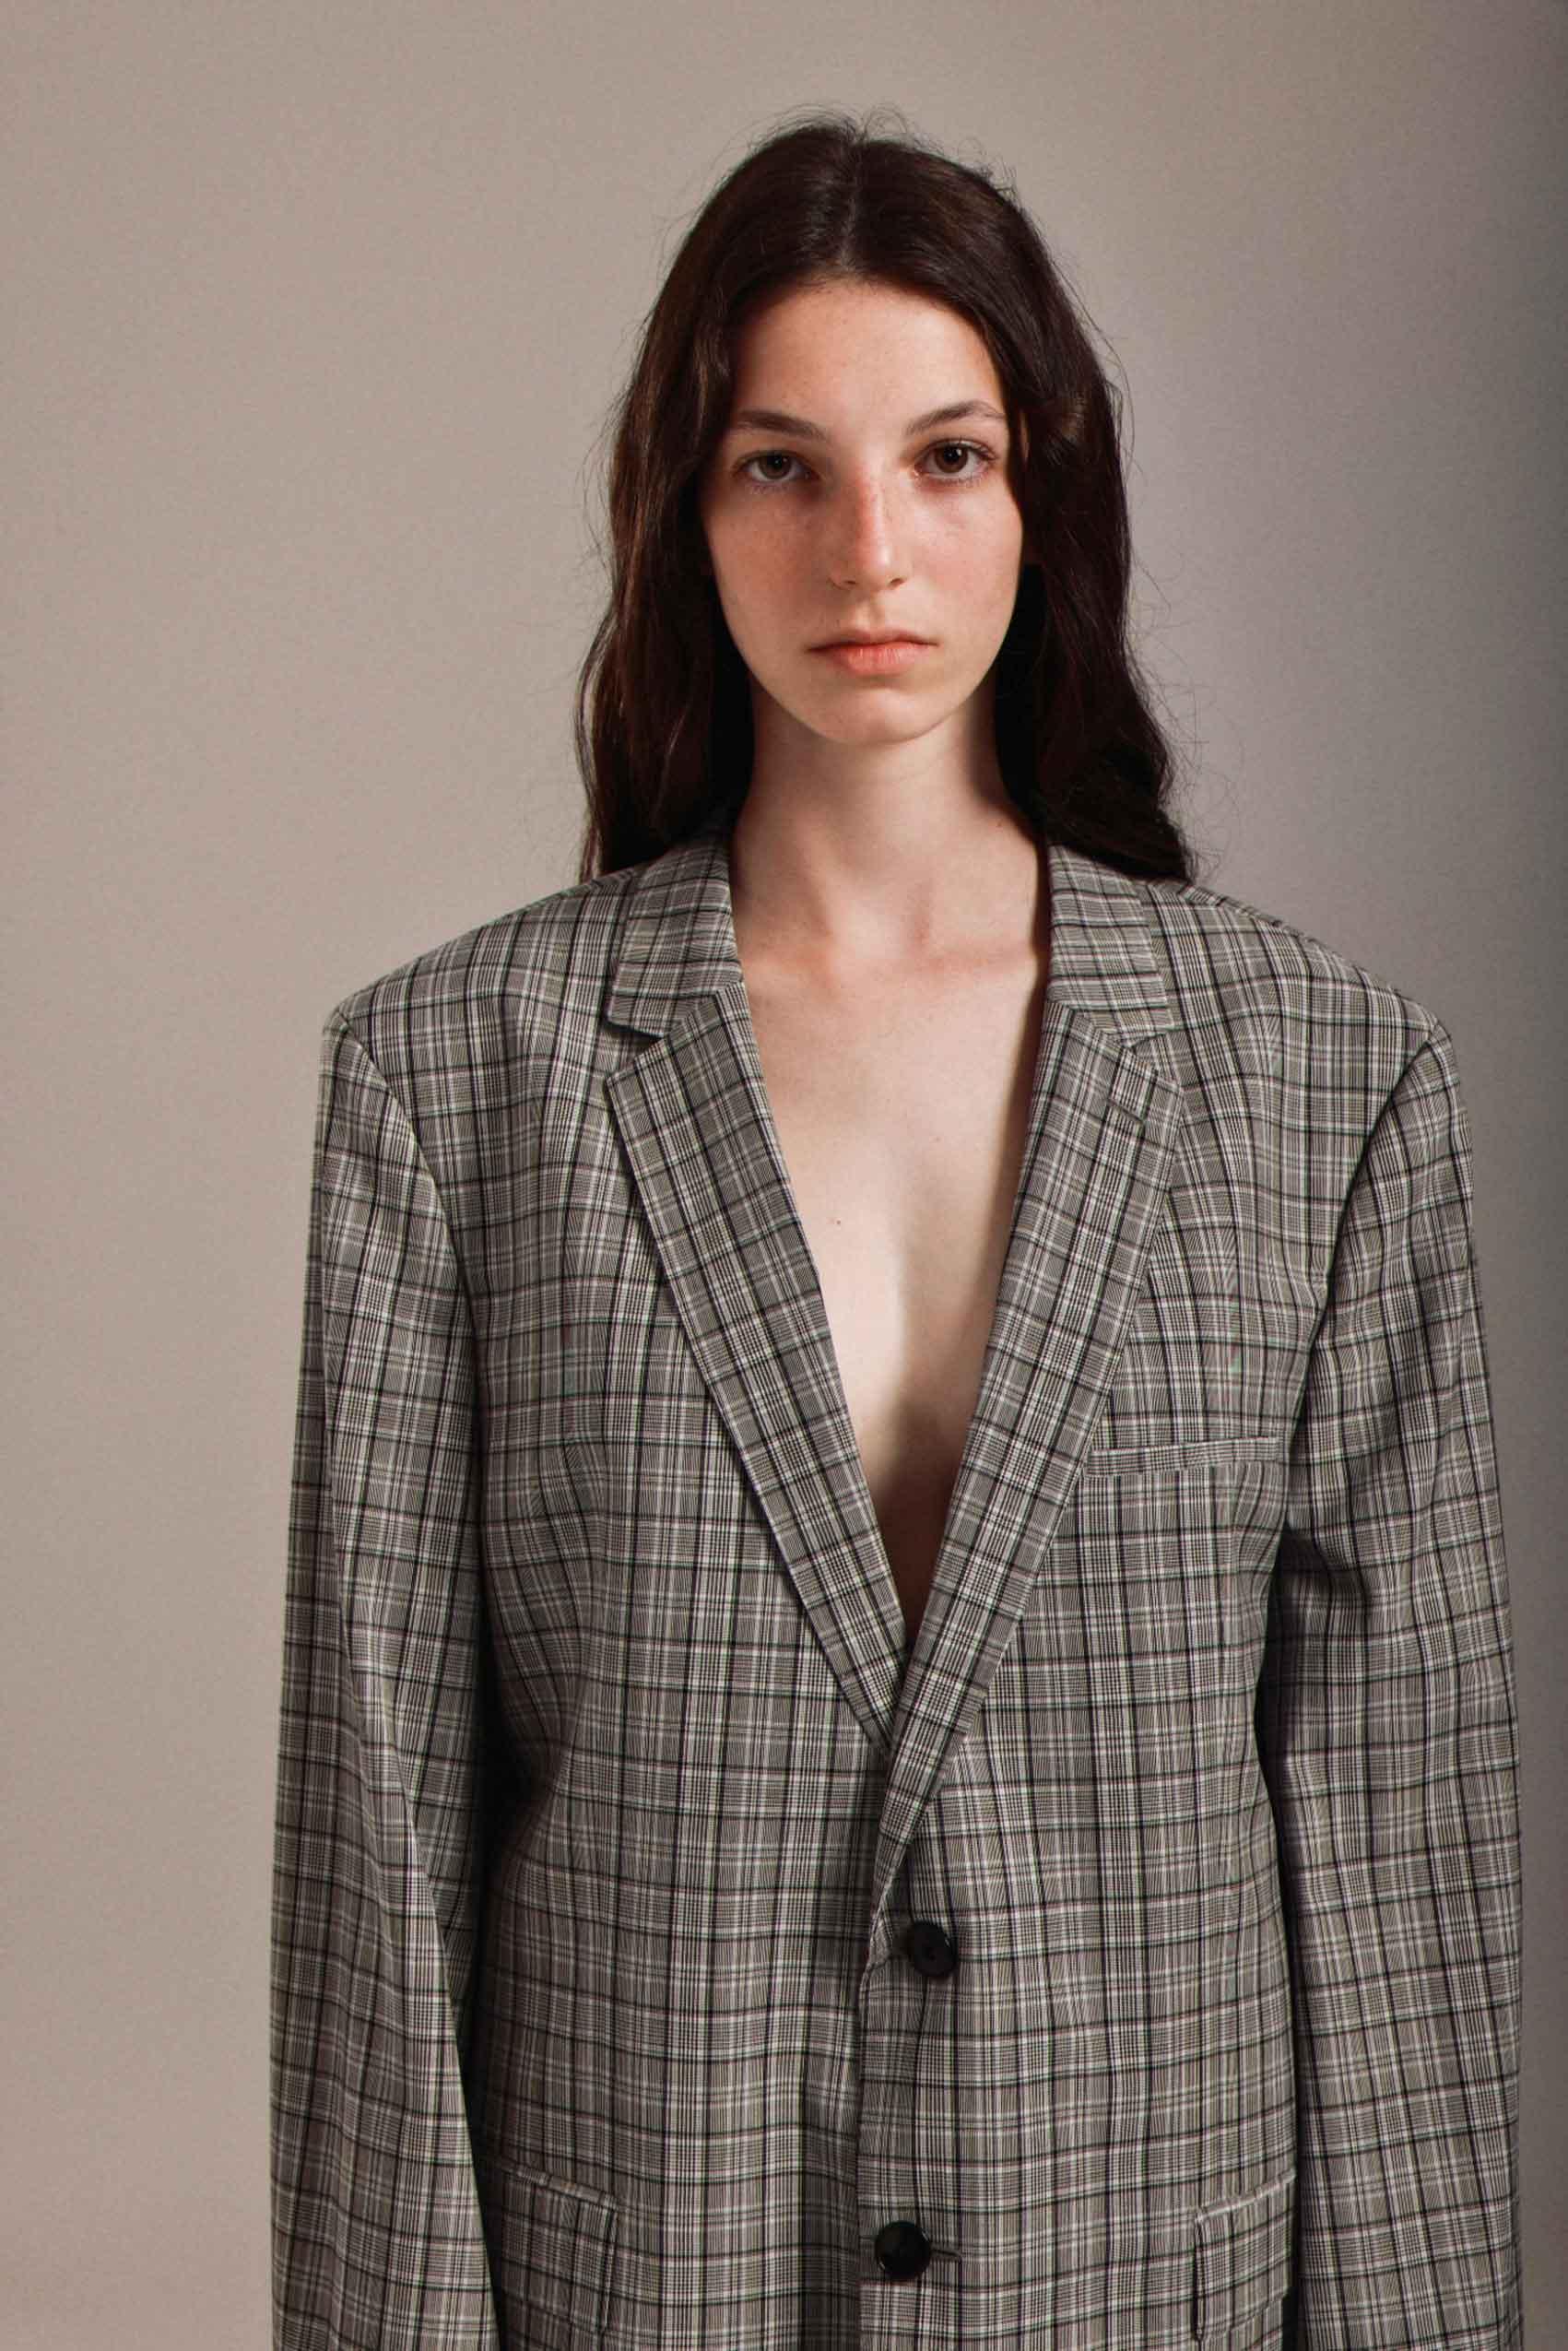 Photographer- Oz Shemesh, Styling - Maor Rabin, Hair - Maor kidushim Agency - yuligroup - Fashion Israel - מגזין אופנה ישראלי-1-9